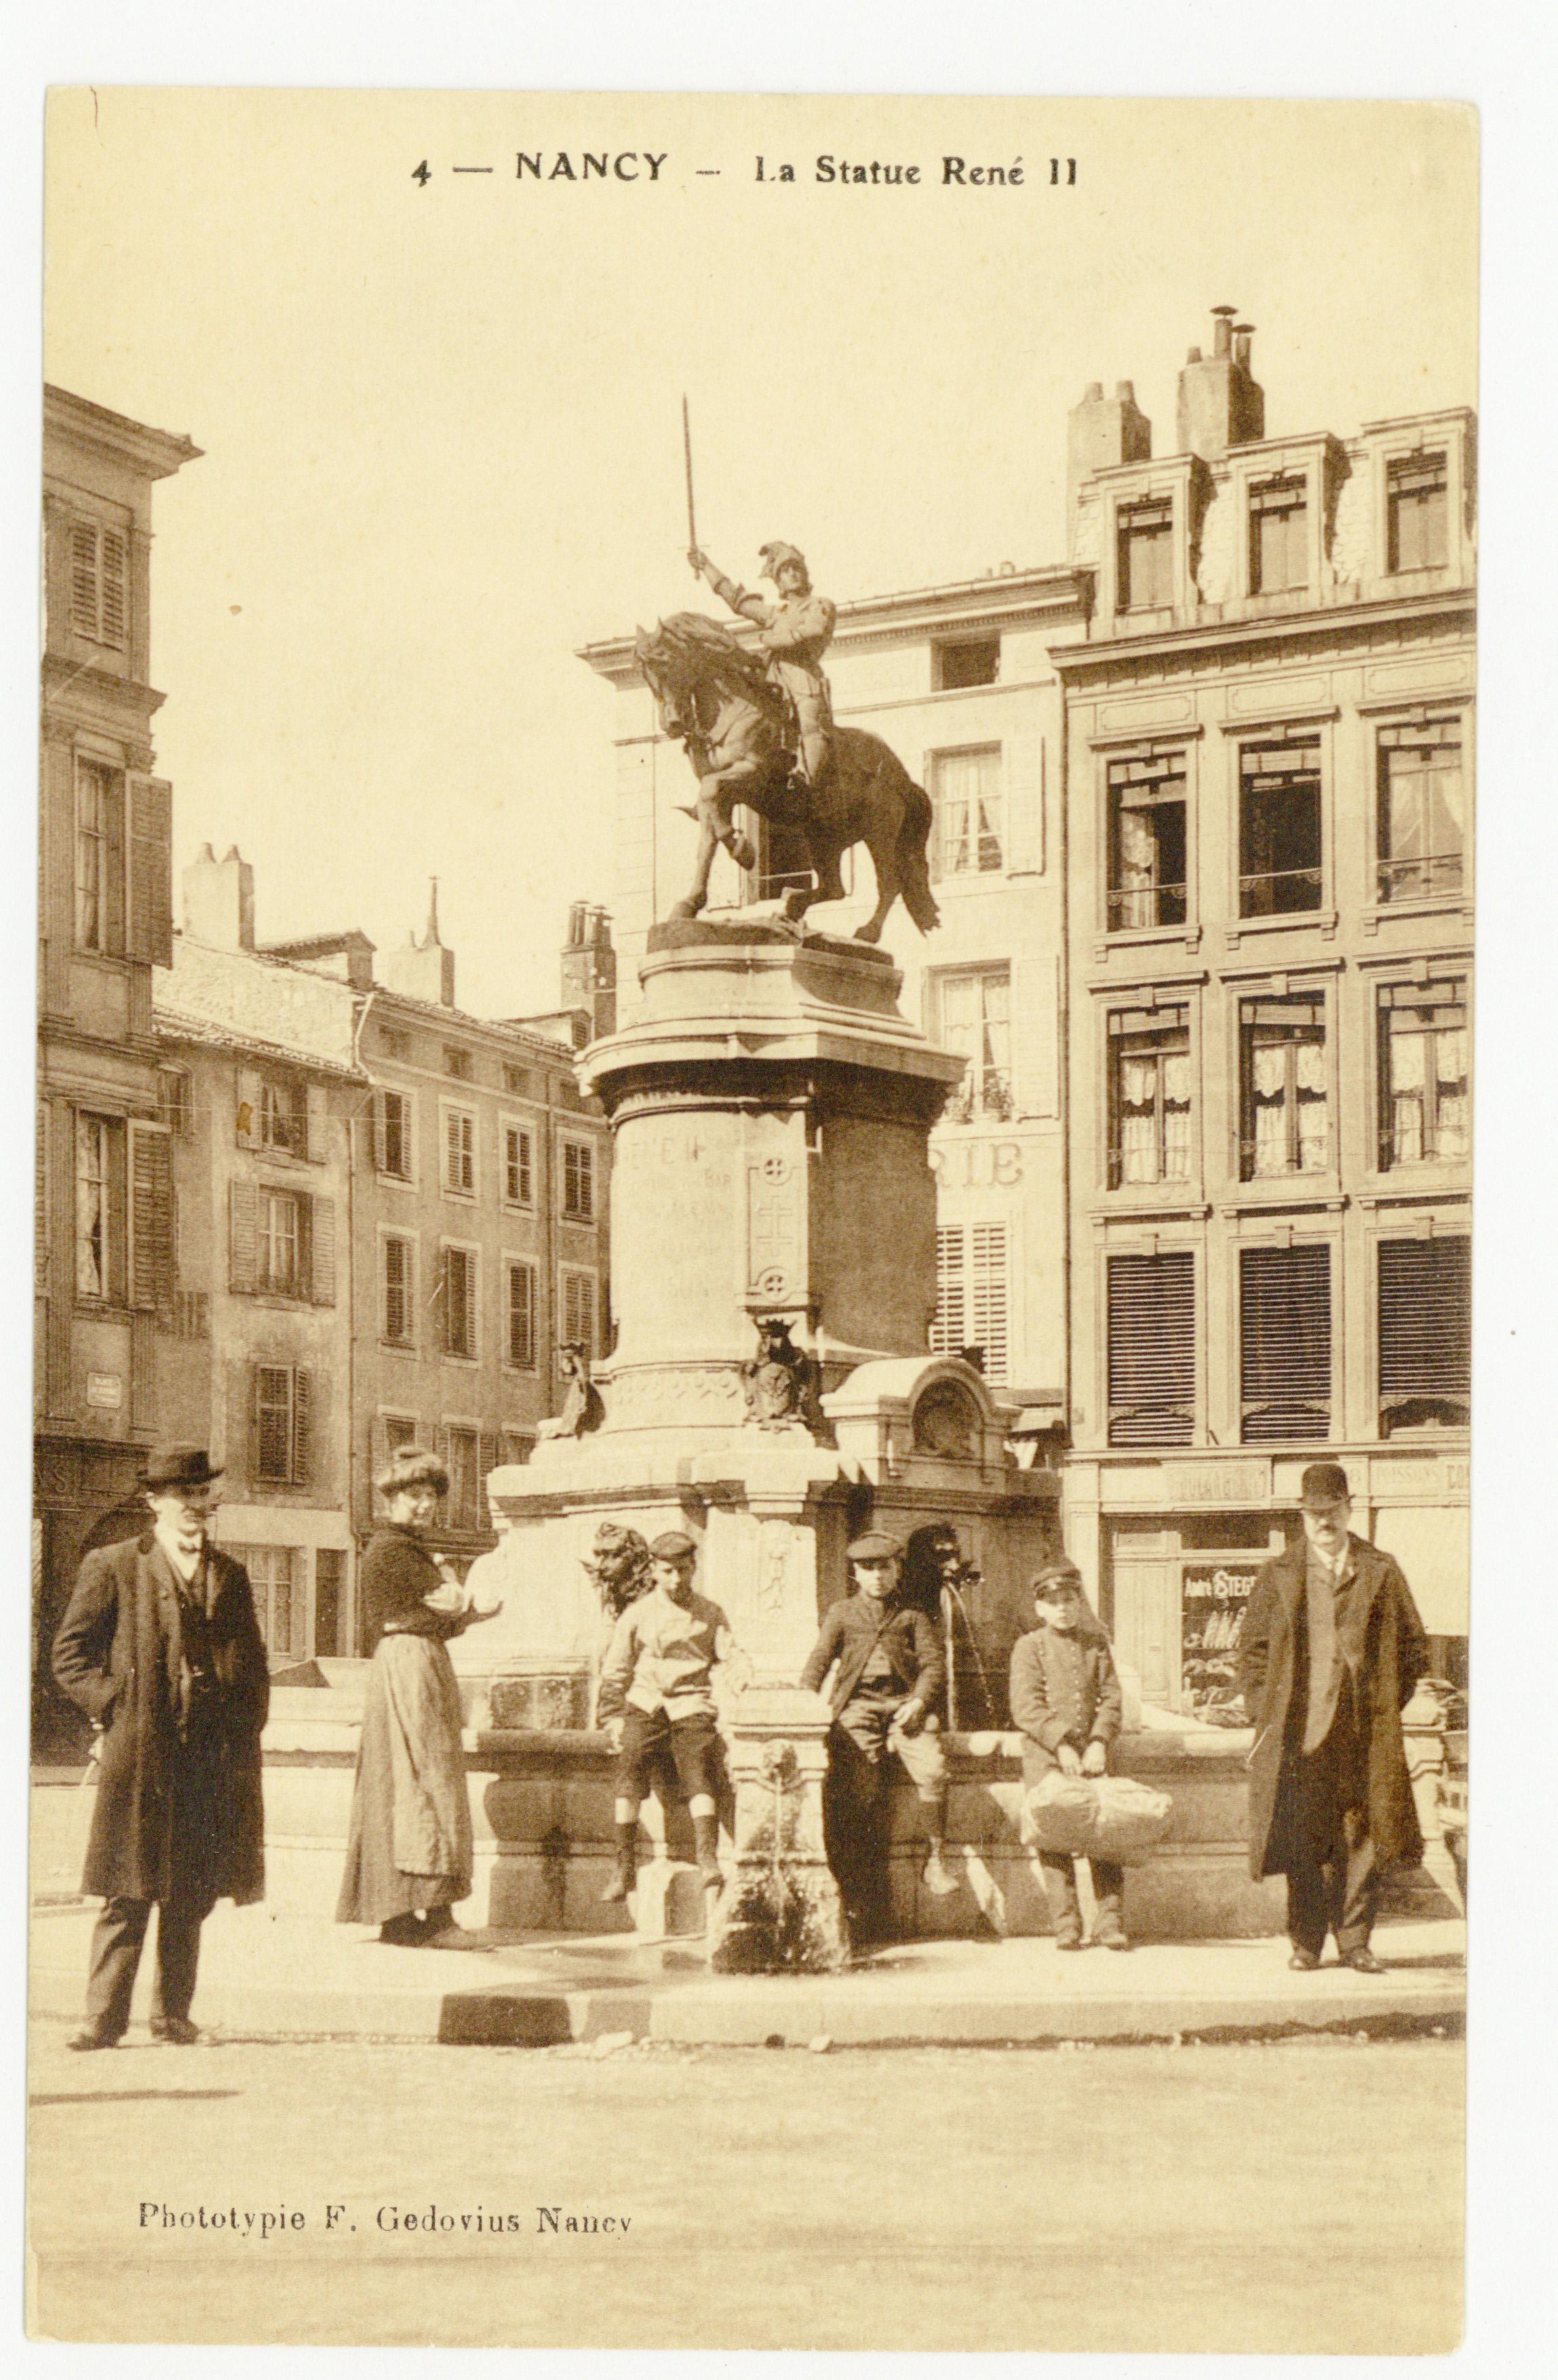 Contenu du Nancy : la statue de René II